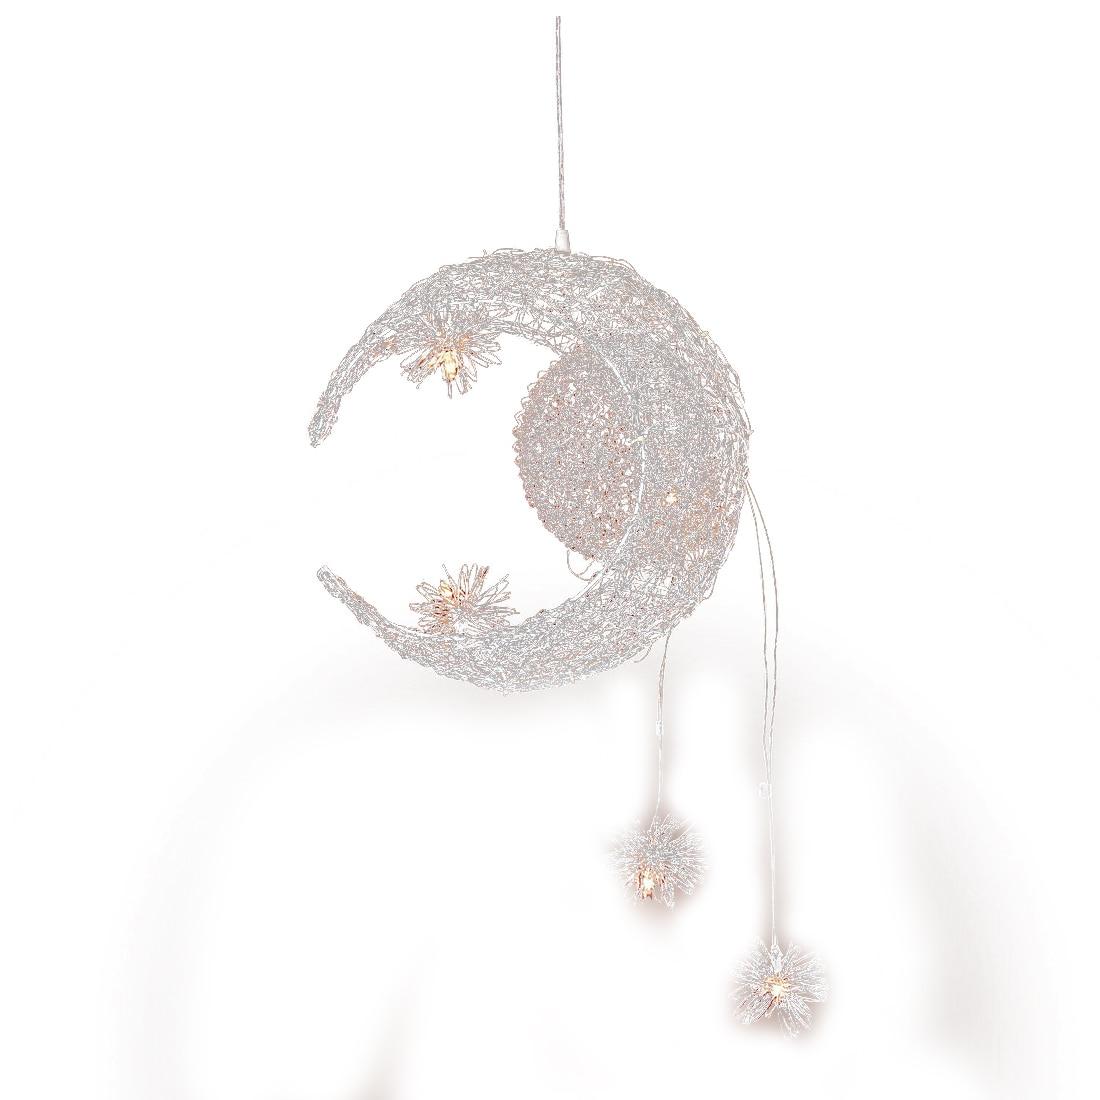 Moon & Star Sweet Bedroom Lighting Pendant Lamp Chandelier Ceiling Light Fixture handmade modern aluminum moon star pendant light lamp for kid children room bedroom lustres decorative fixture lighting pll 625